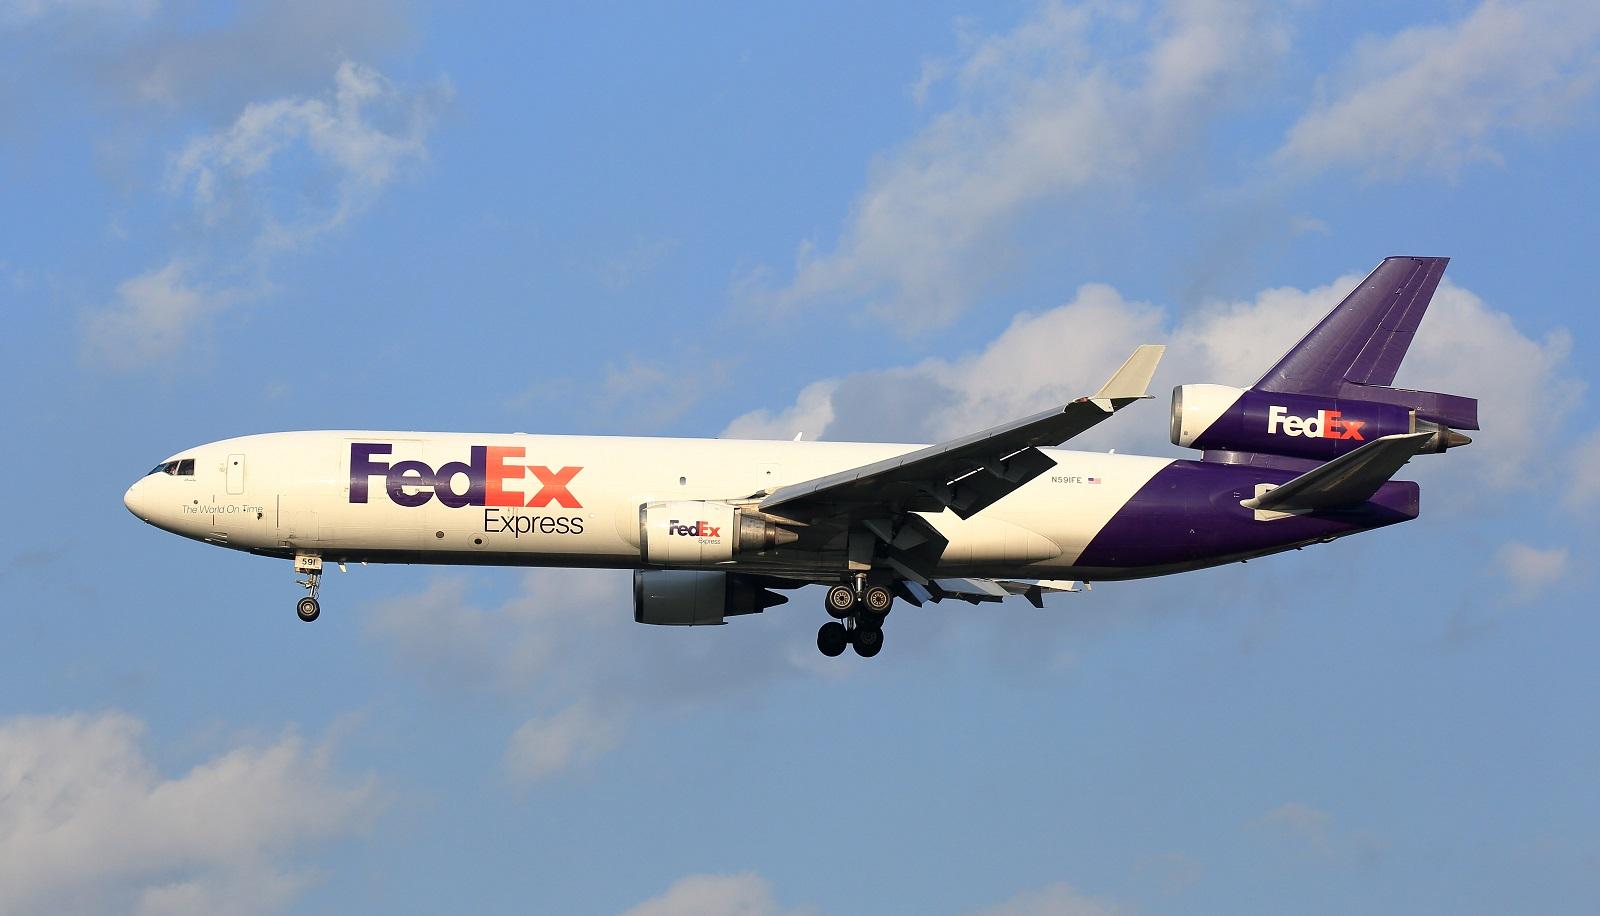 Fedex170908tk596